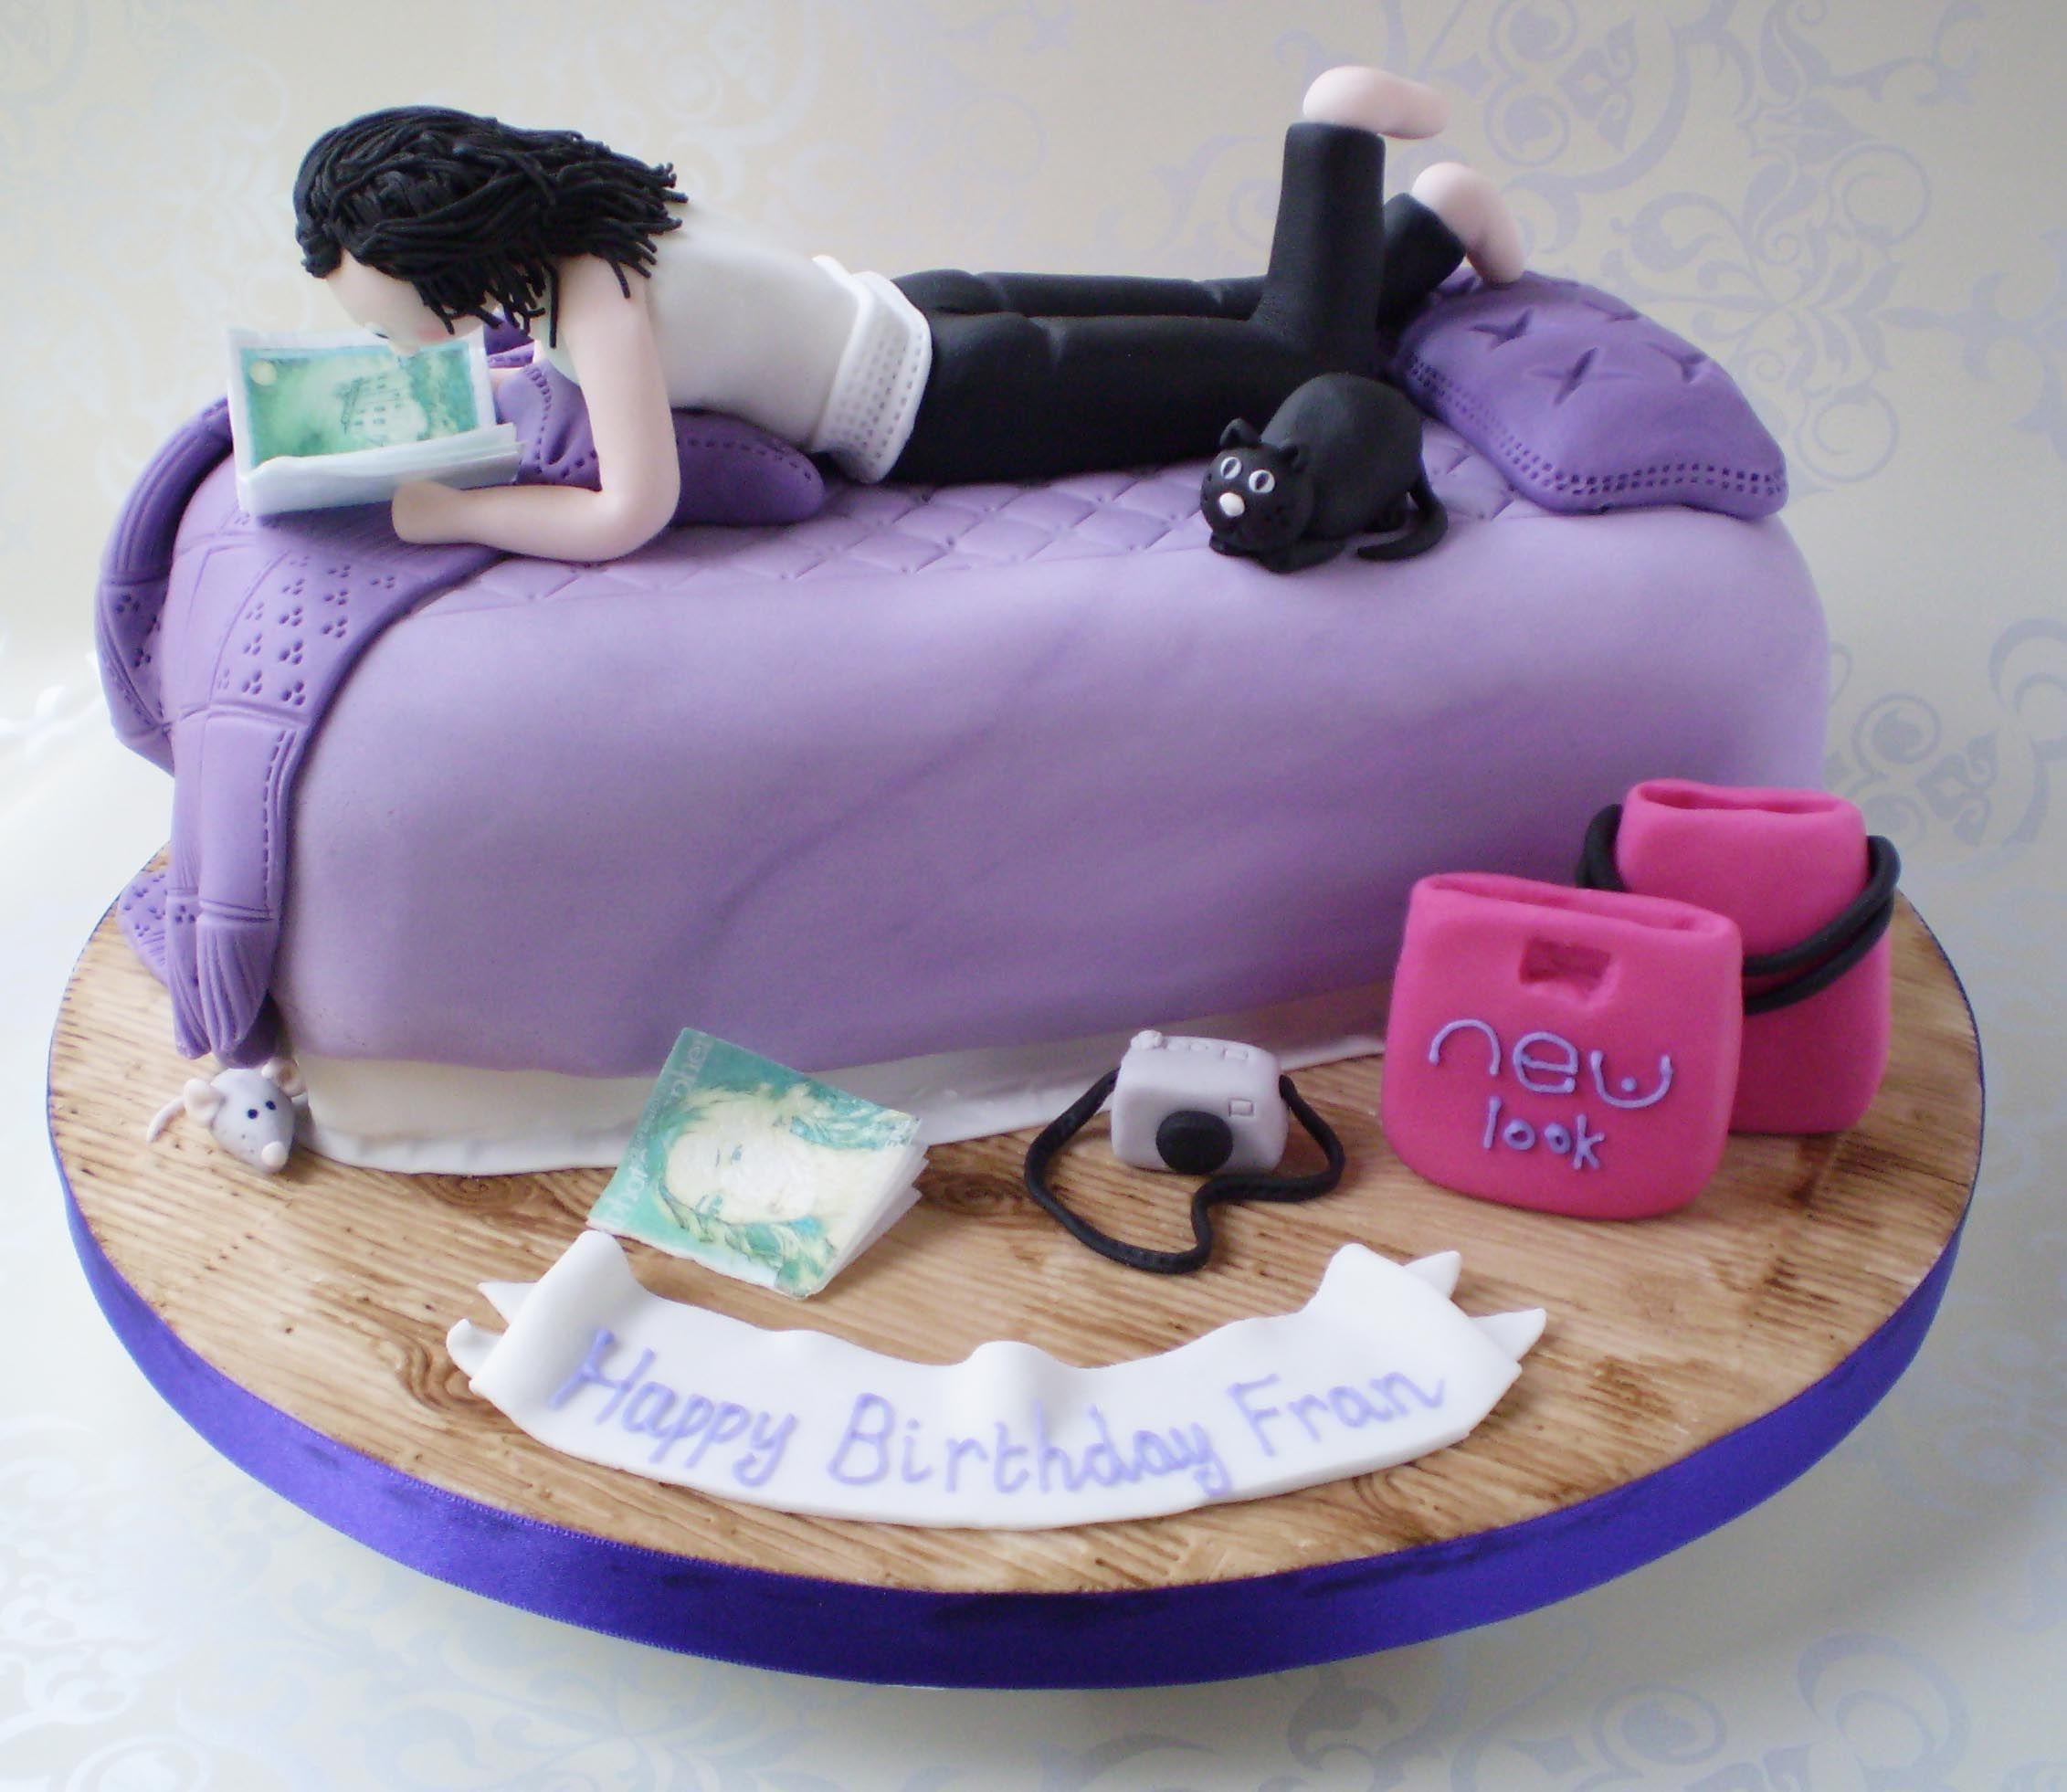 Teenagers Bedroom Birthday Cake Cakepins